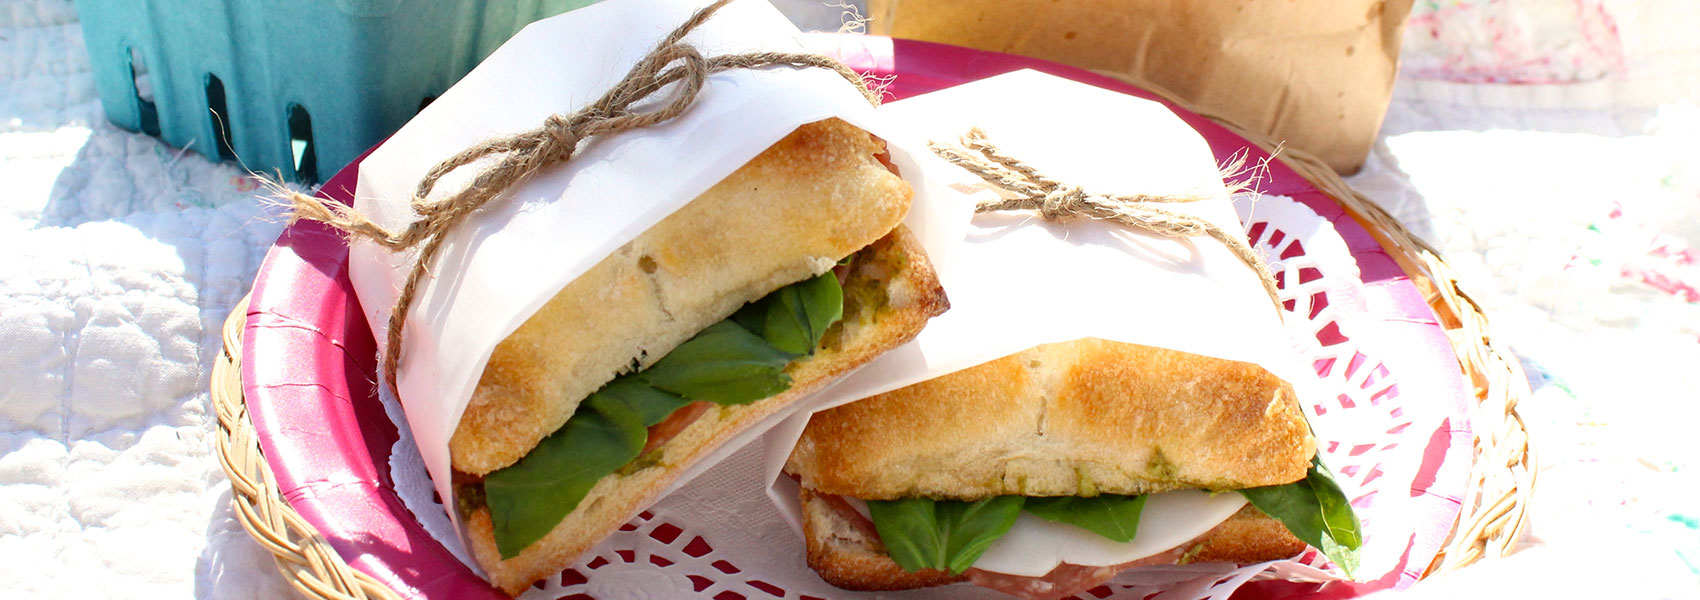 Gourmet Picnic Sandwich